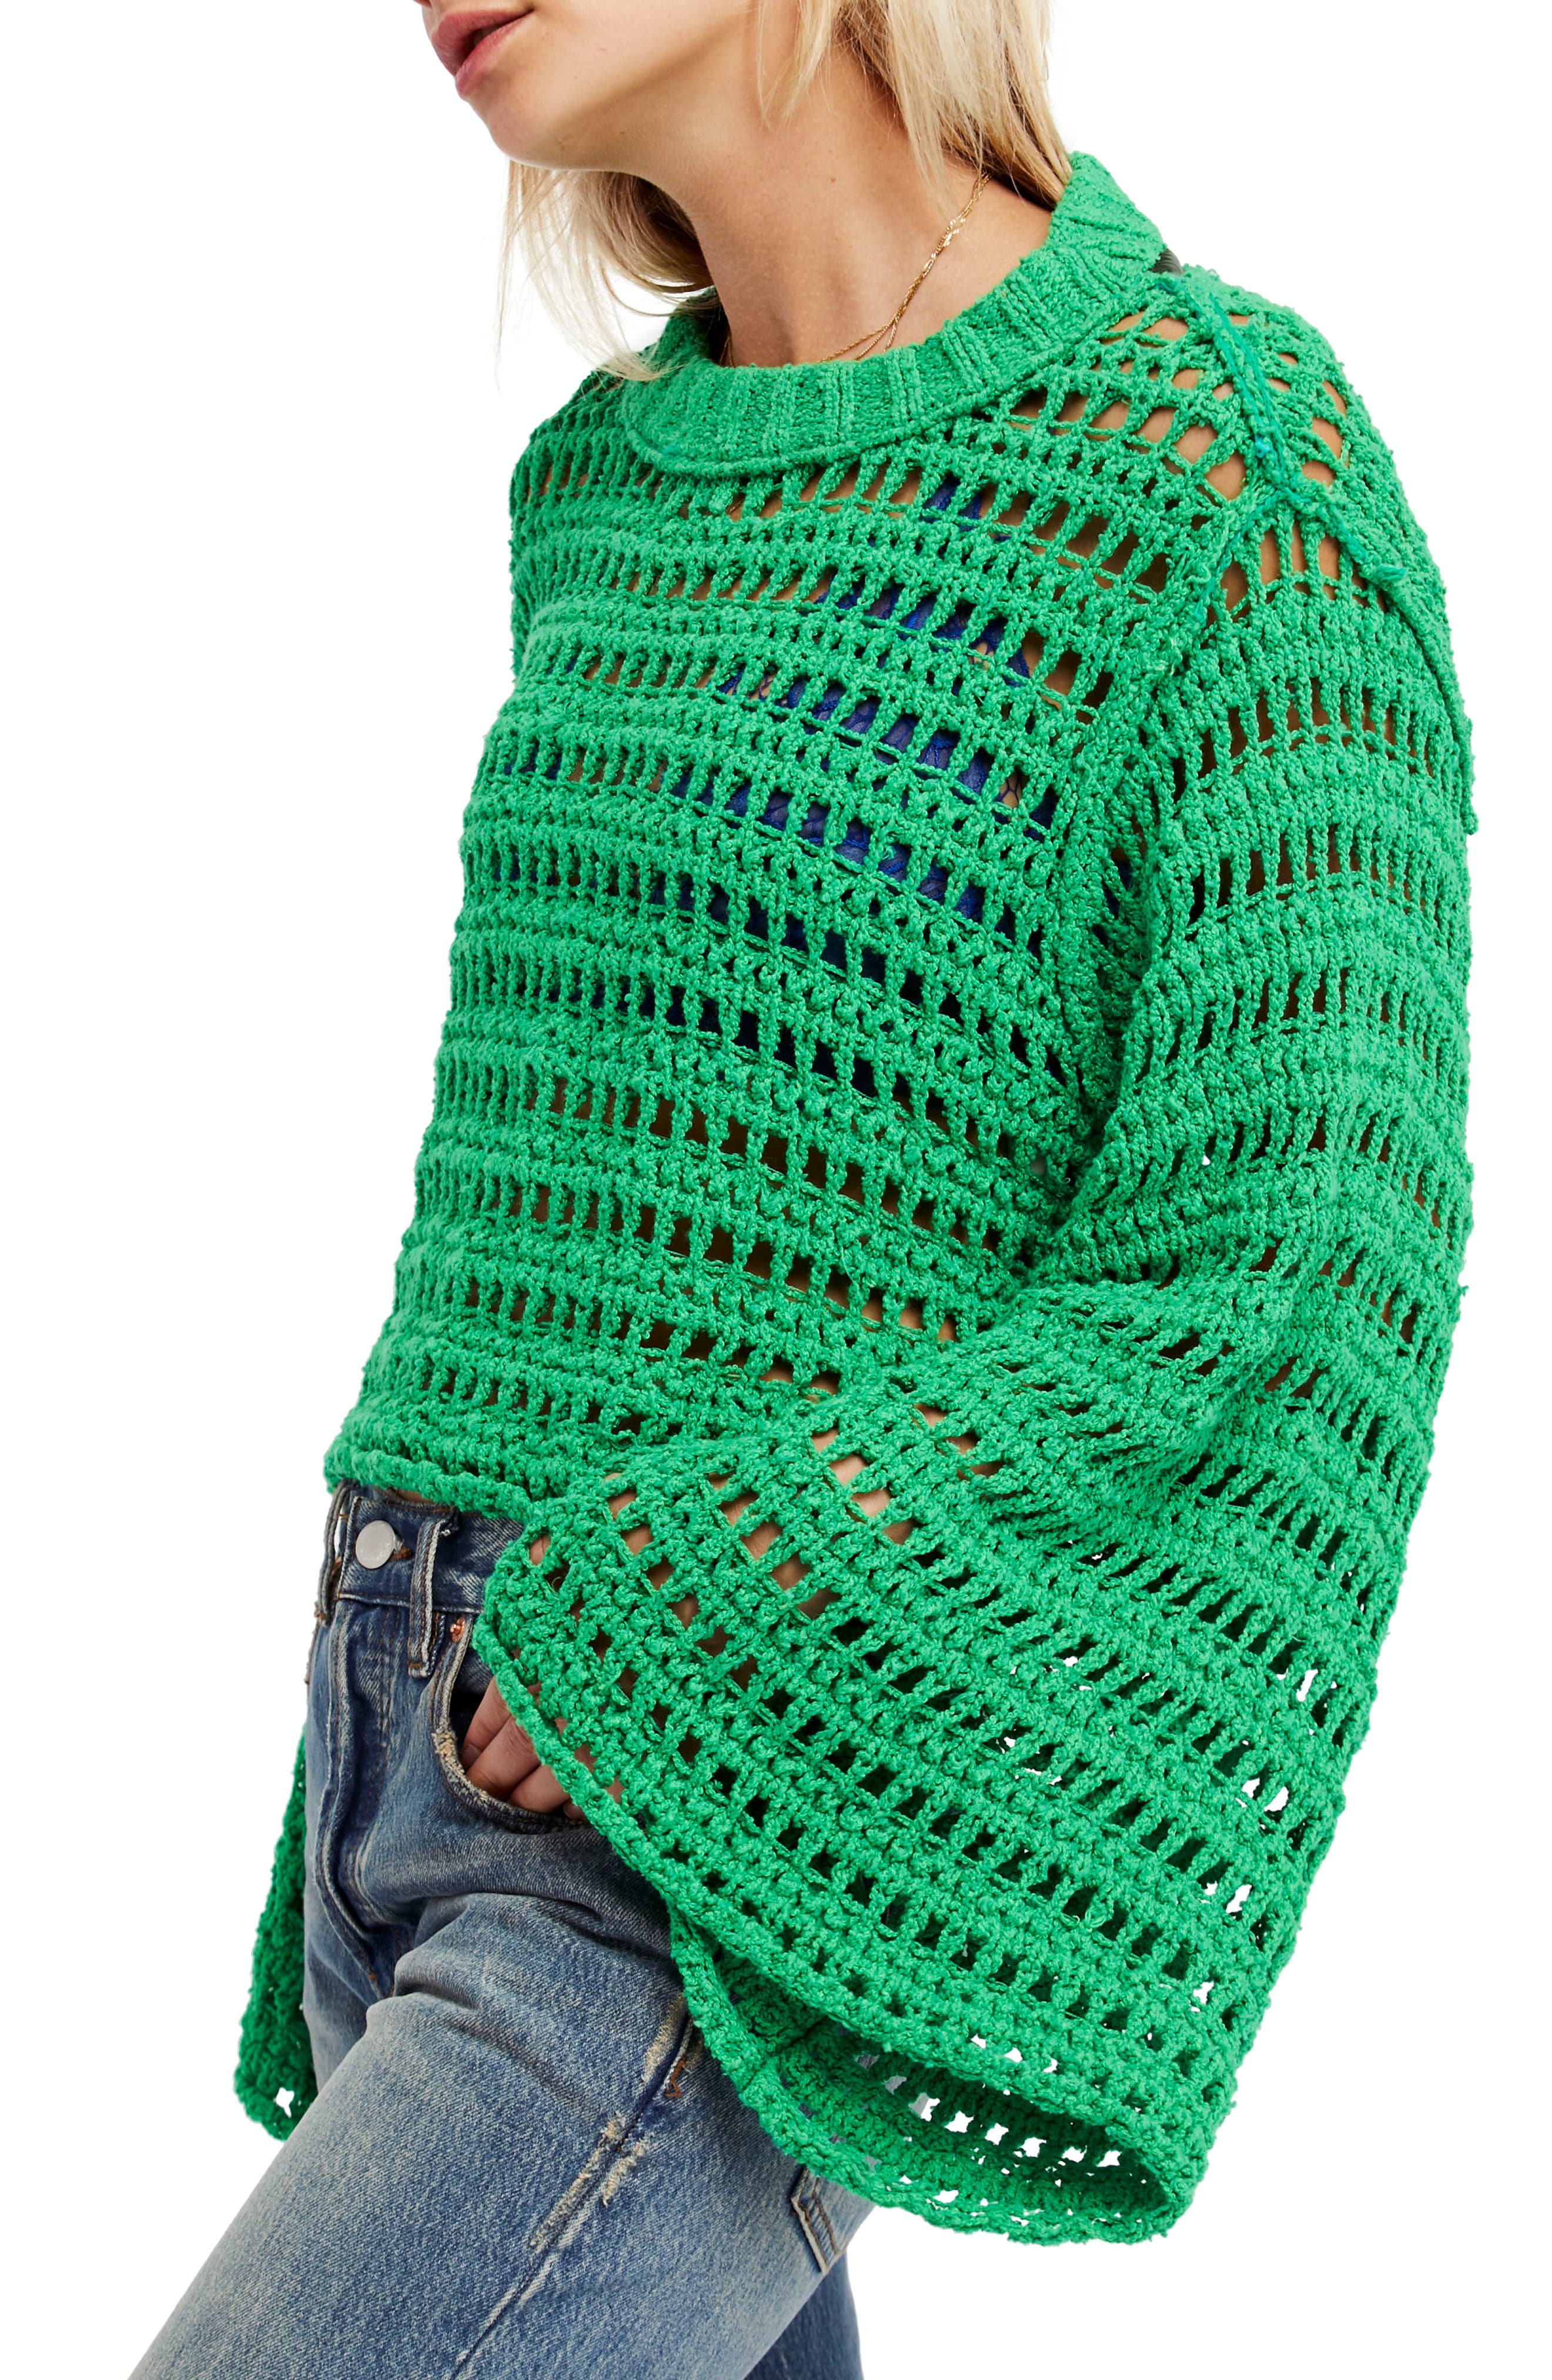 Caught Up Crochet Top,                             Main thumbnail 1, color,                             Kelly Green